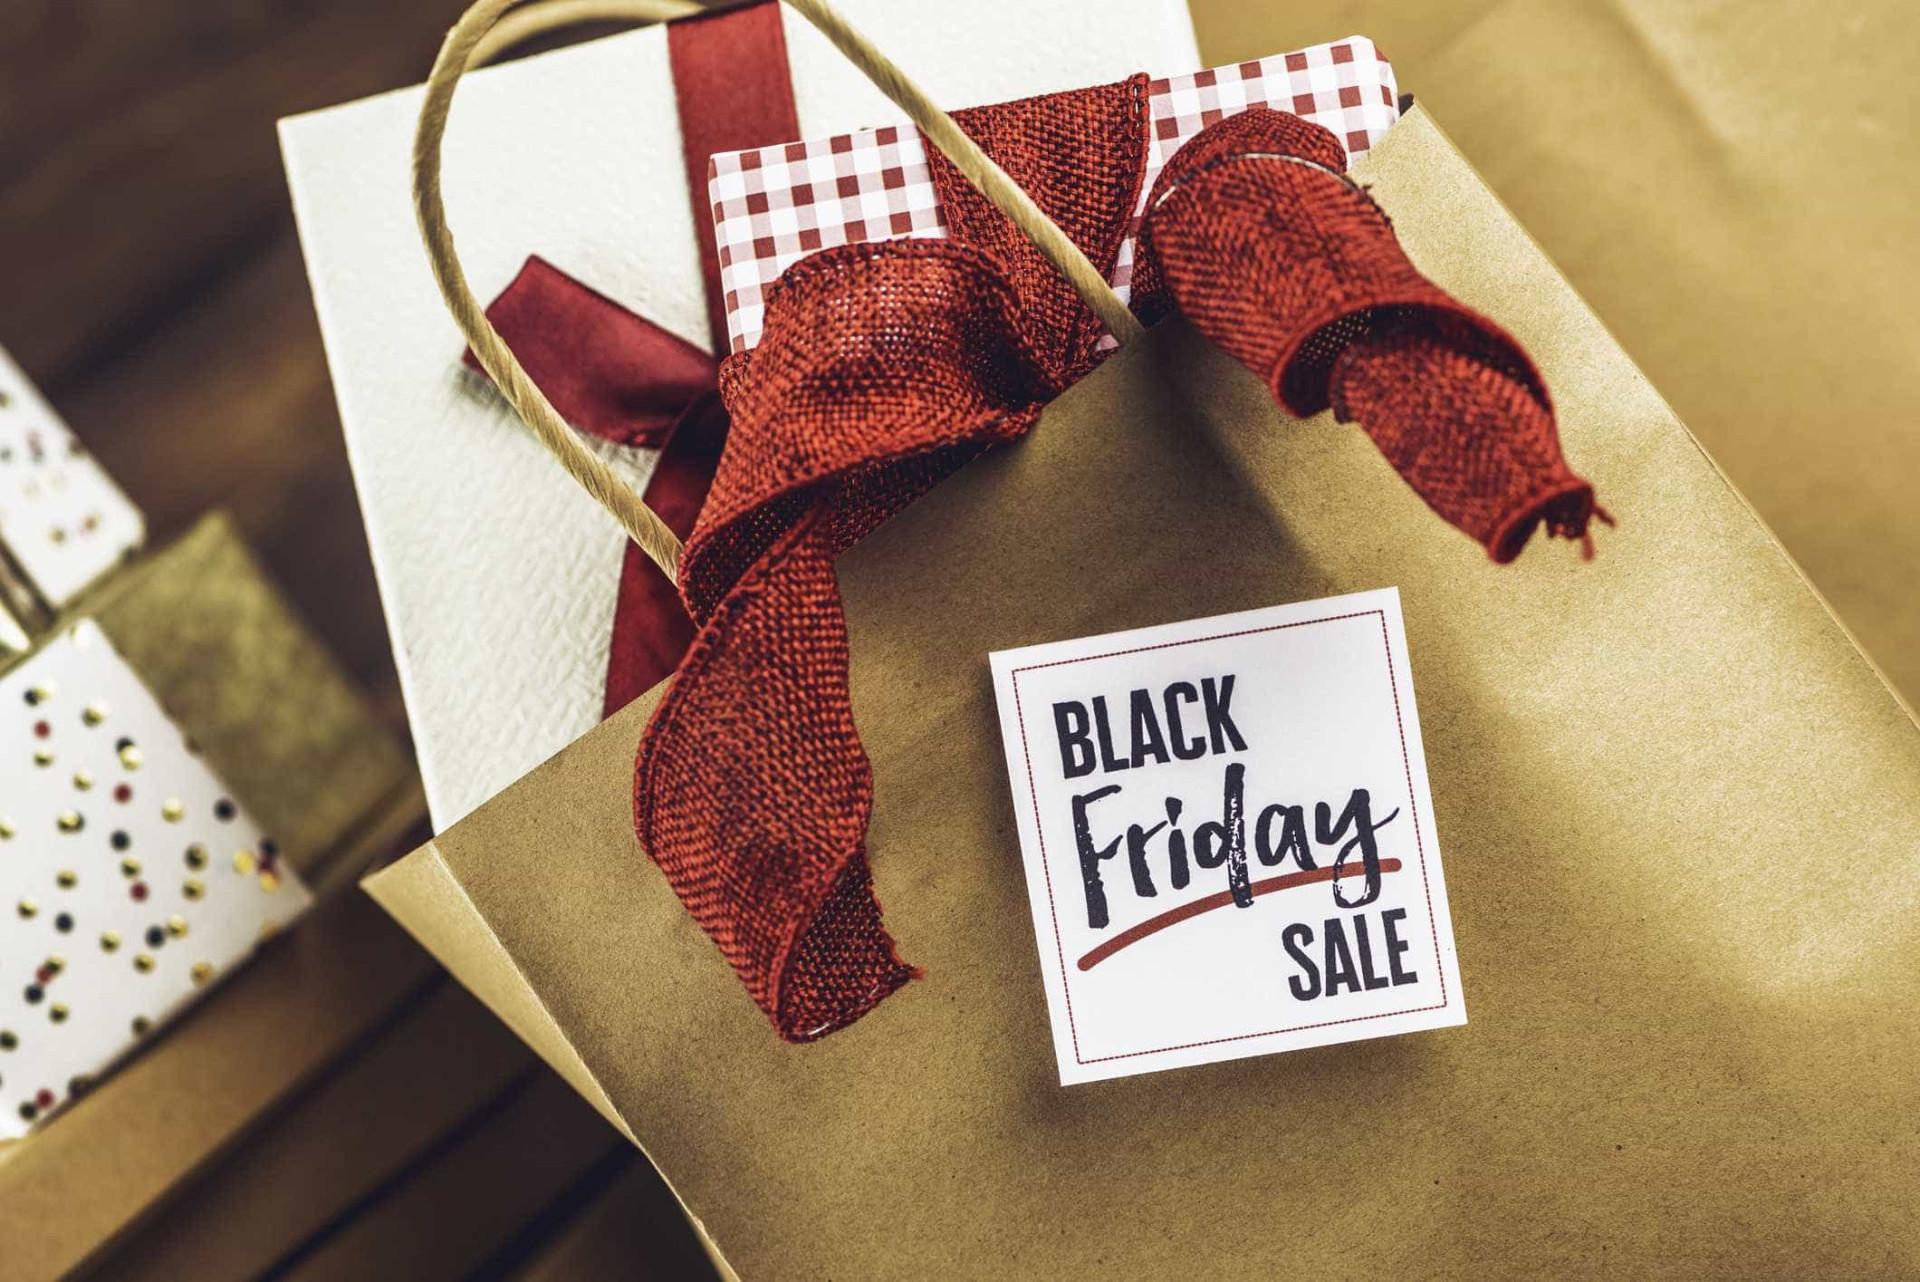 Na selva das compras de Natal, siga estas dicas para controlar os gastos